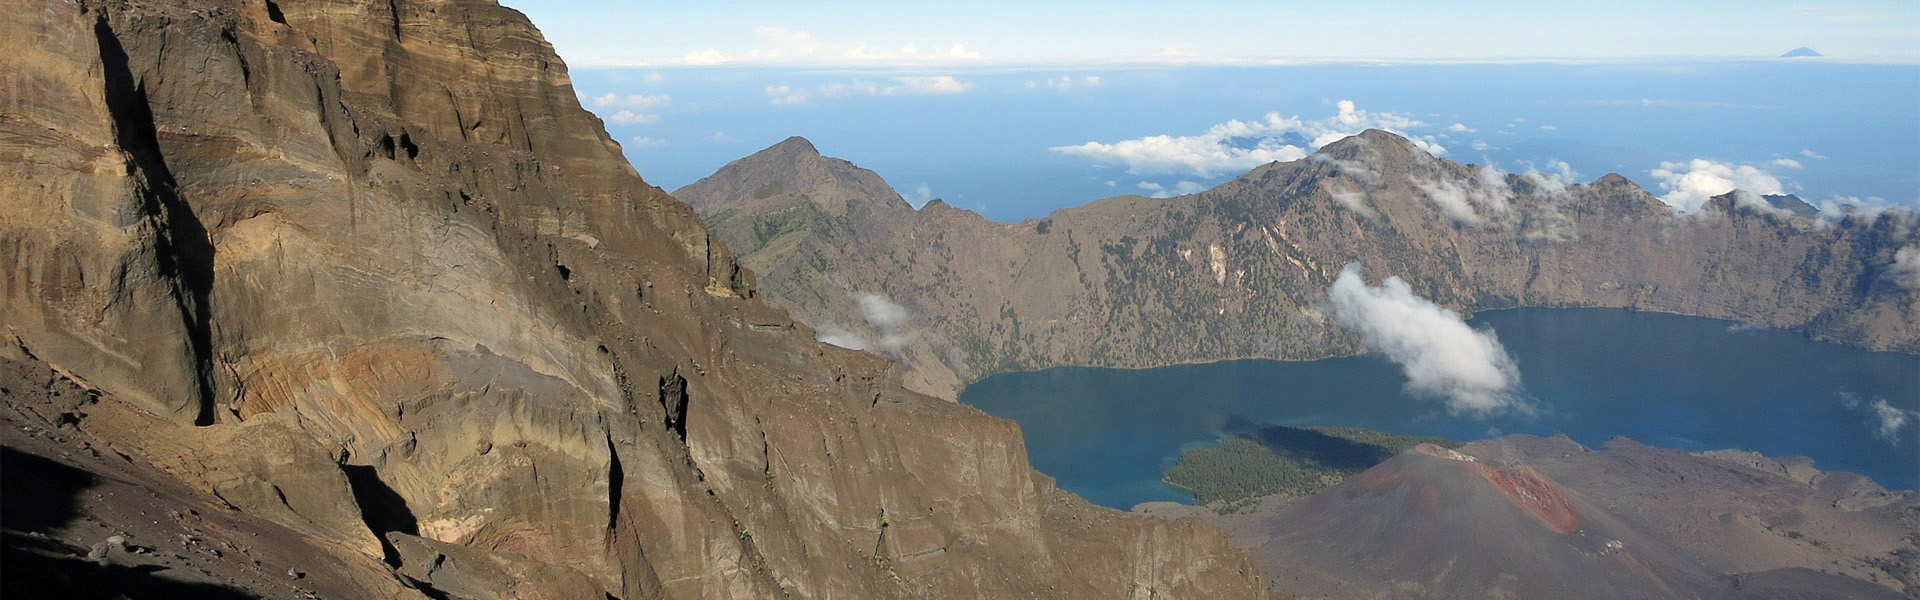 Segara Anak Crater Lake from Rinjani summit